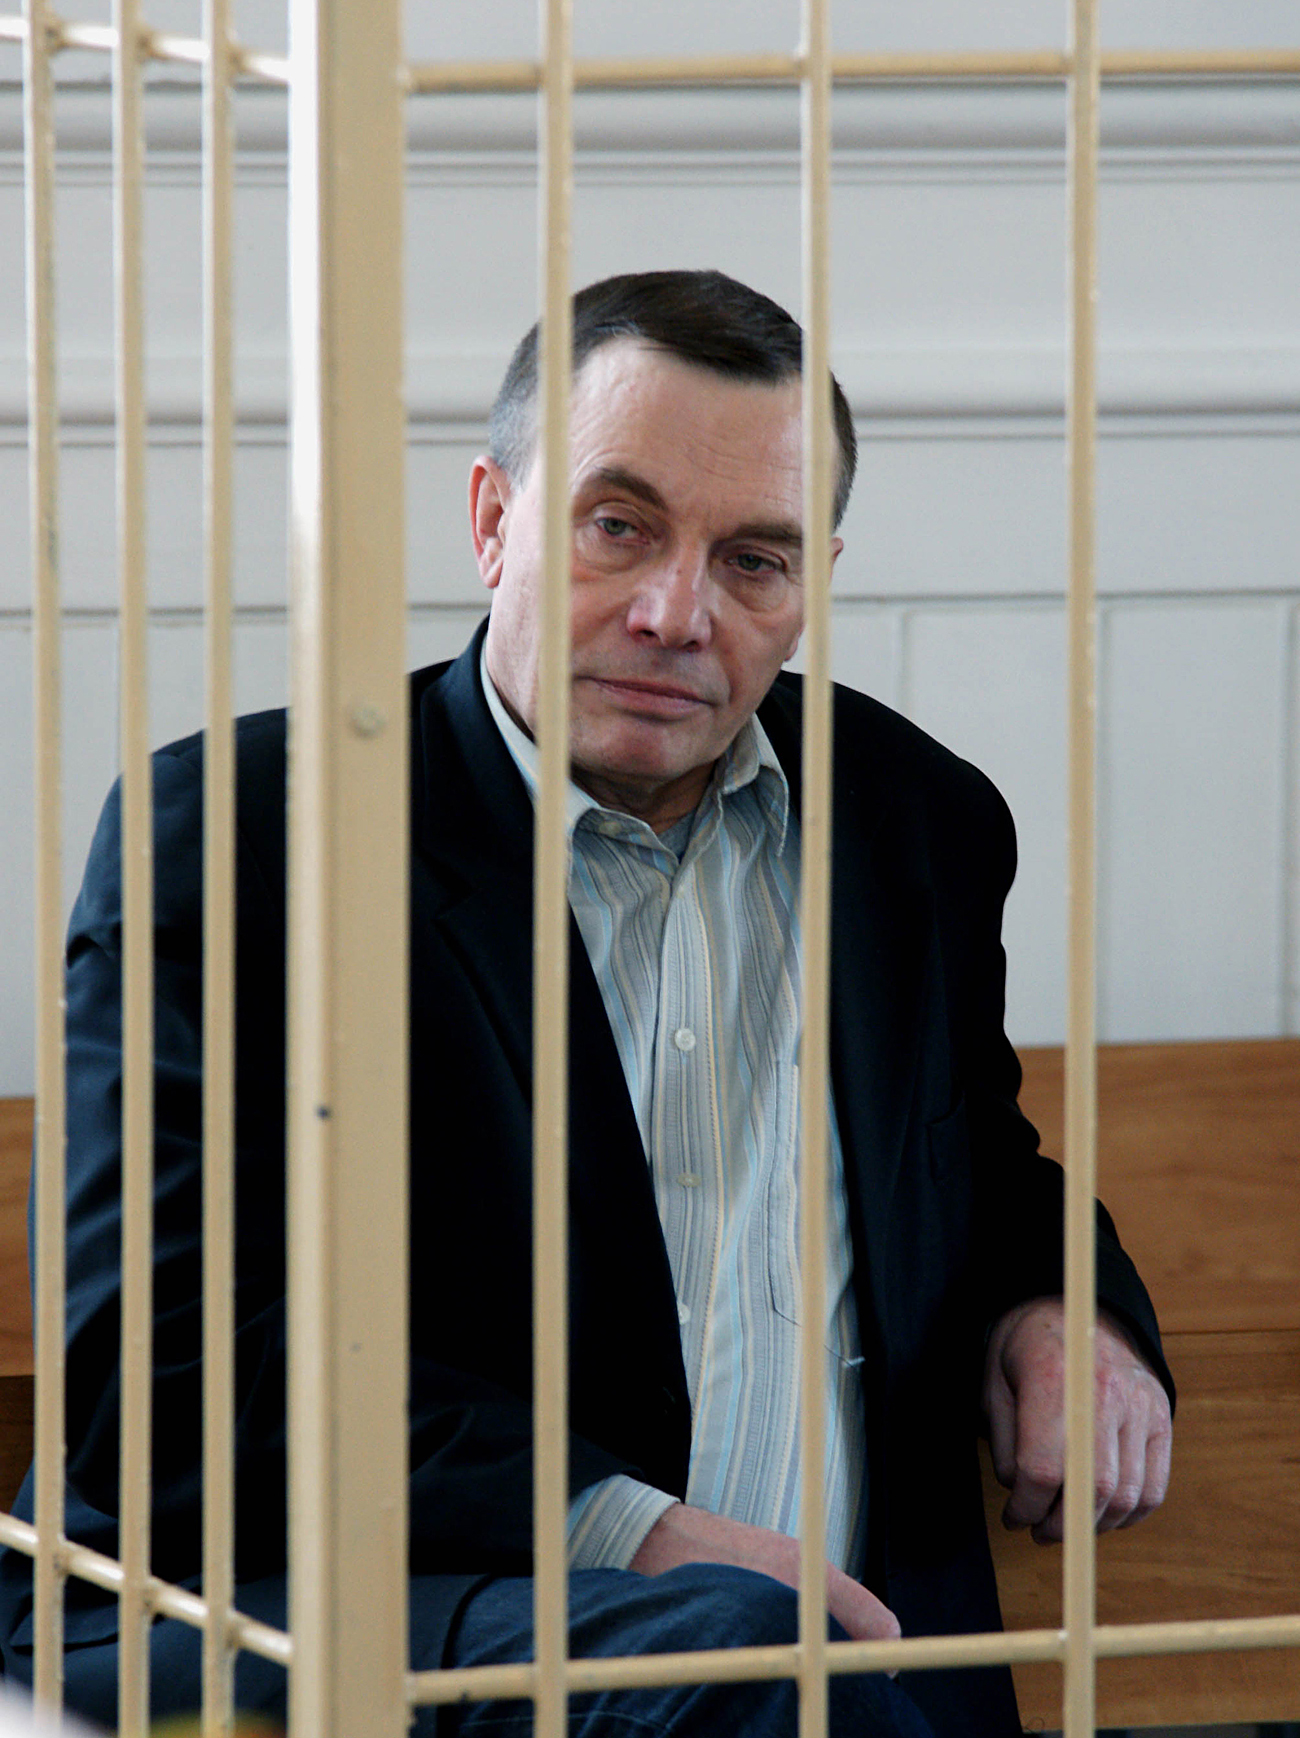 Nikolai Utkin, the former mayor of Togliatti, an automotive industrial center on the Volga, was tried by the Samara regional court for bribery and abuse of office. Source: Yuri Streletc/RIA Novosti